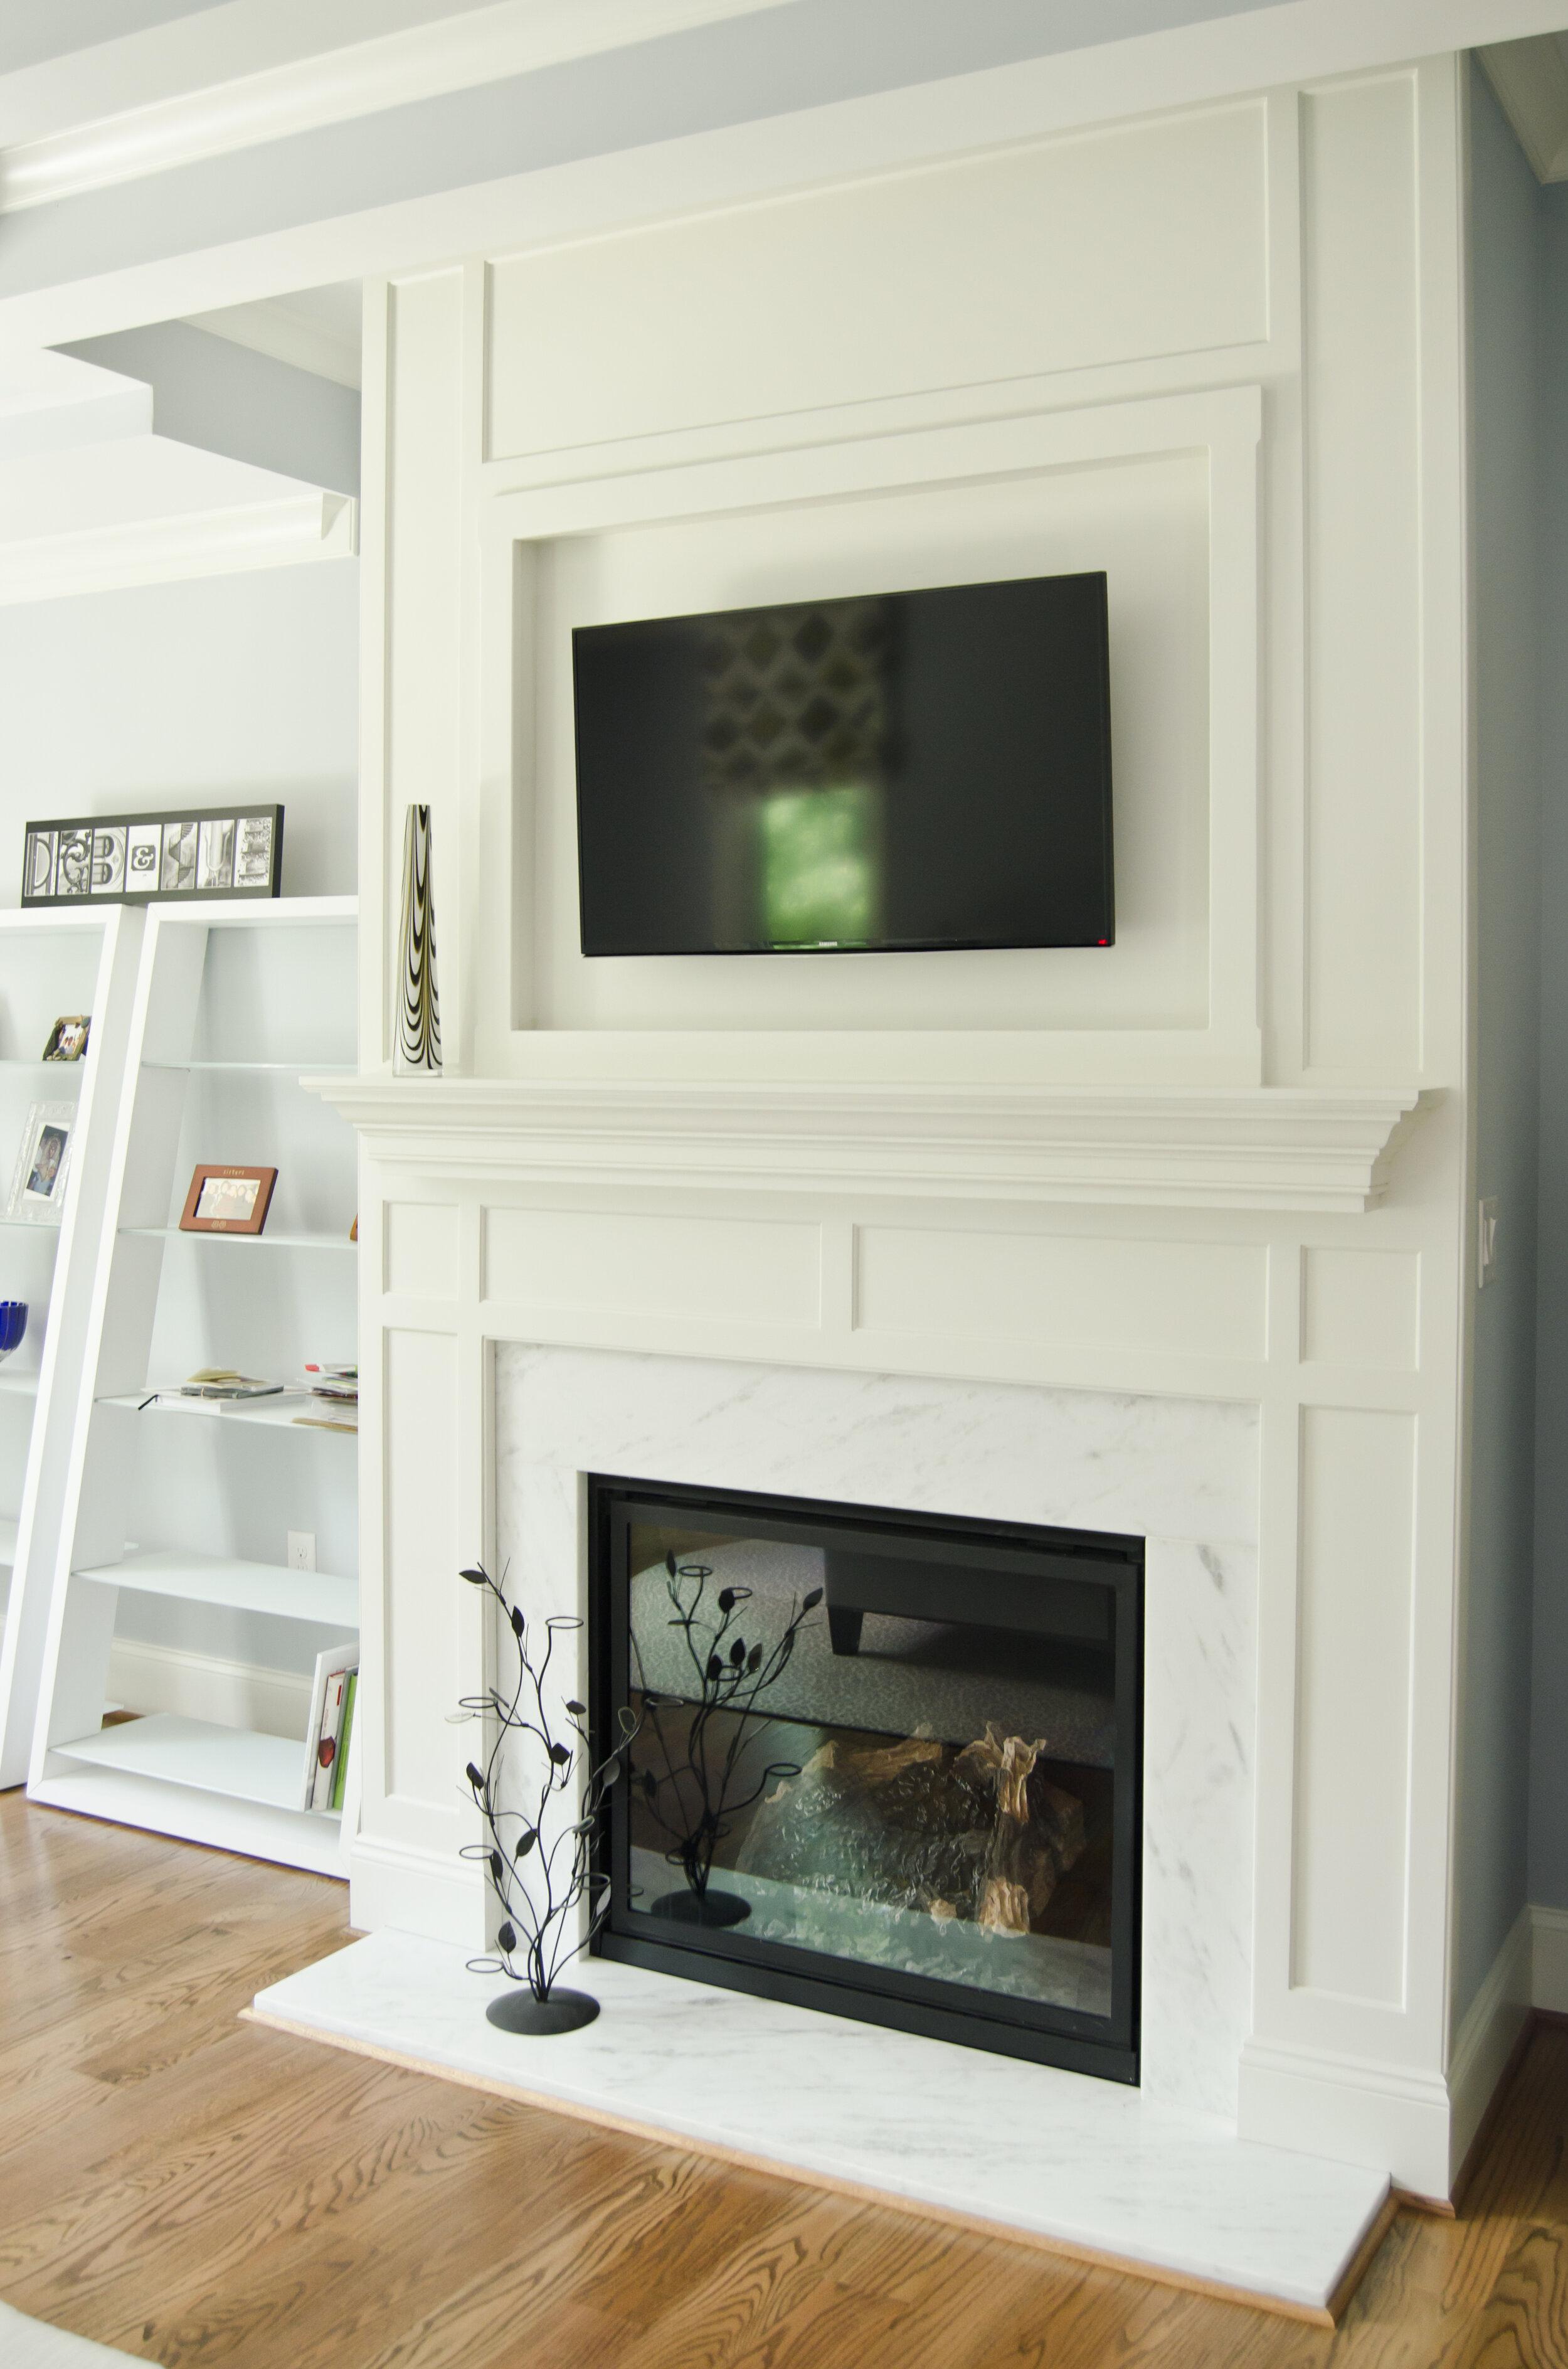 Kerry_Beth_Photo_Courtney_Ludeman_Interiors_Richmond_Interior_Designer_General_Contractor-50.jpg